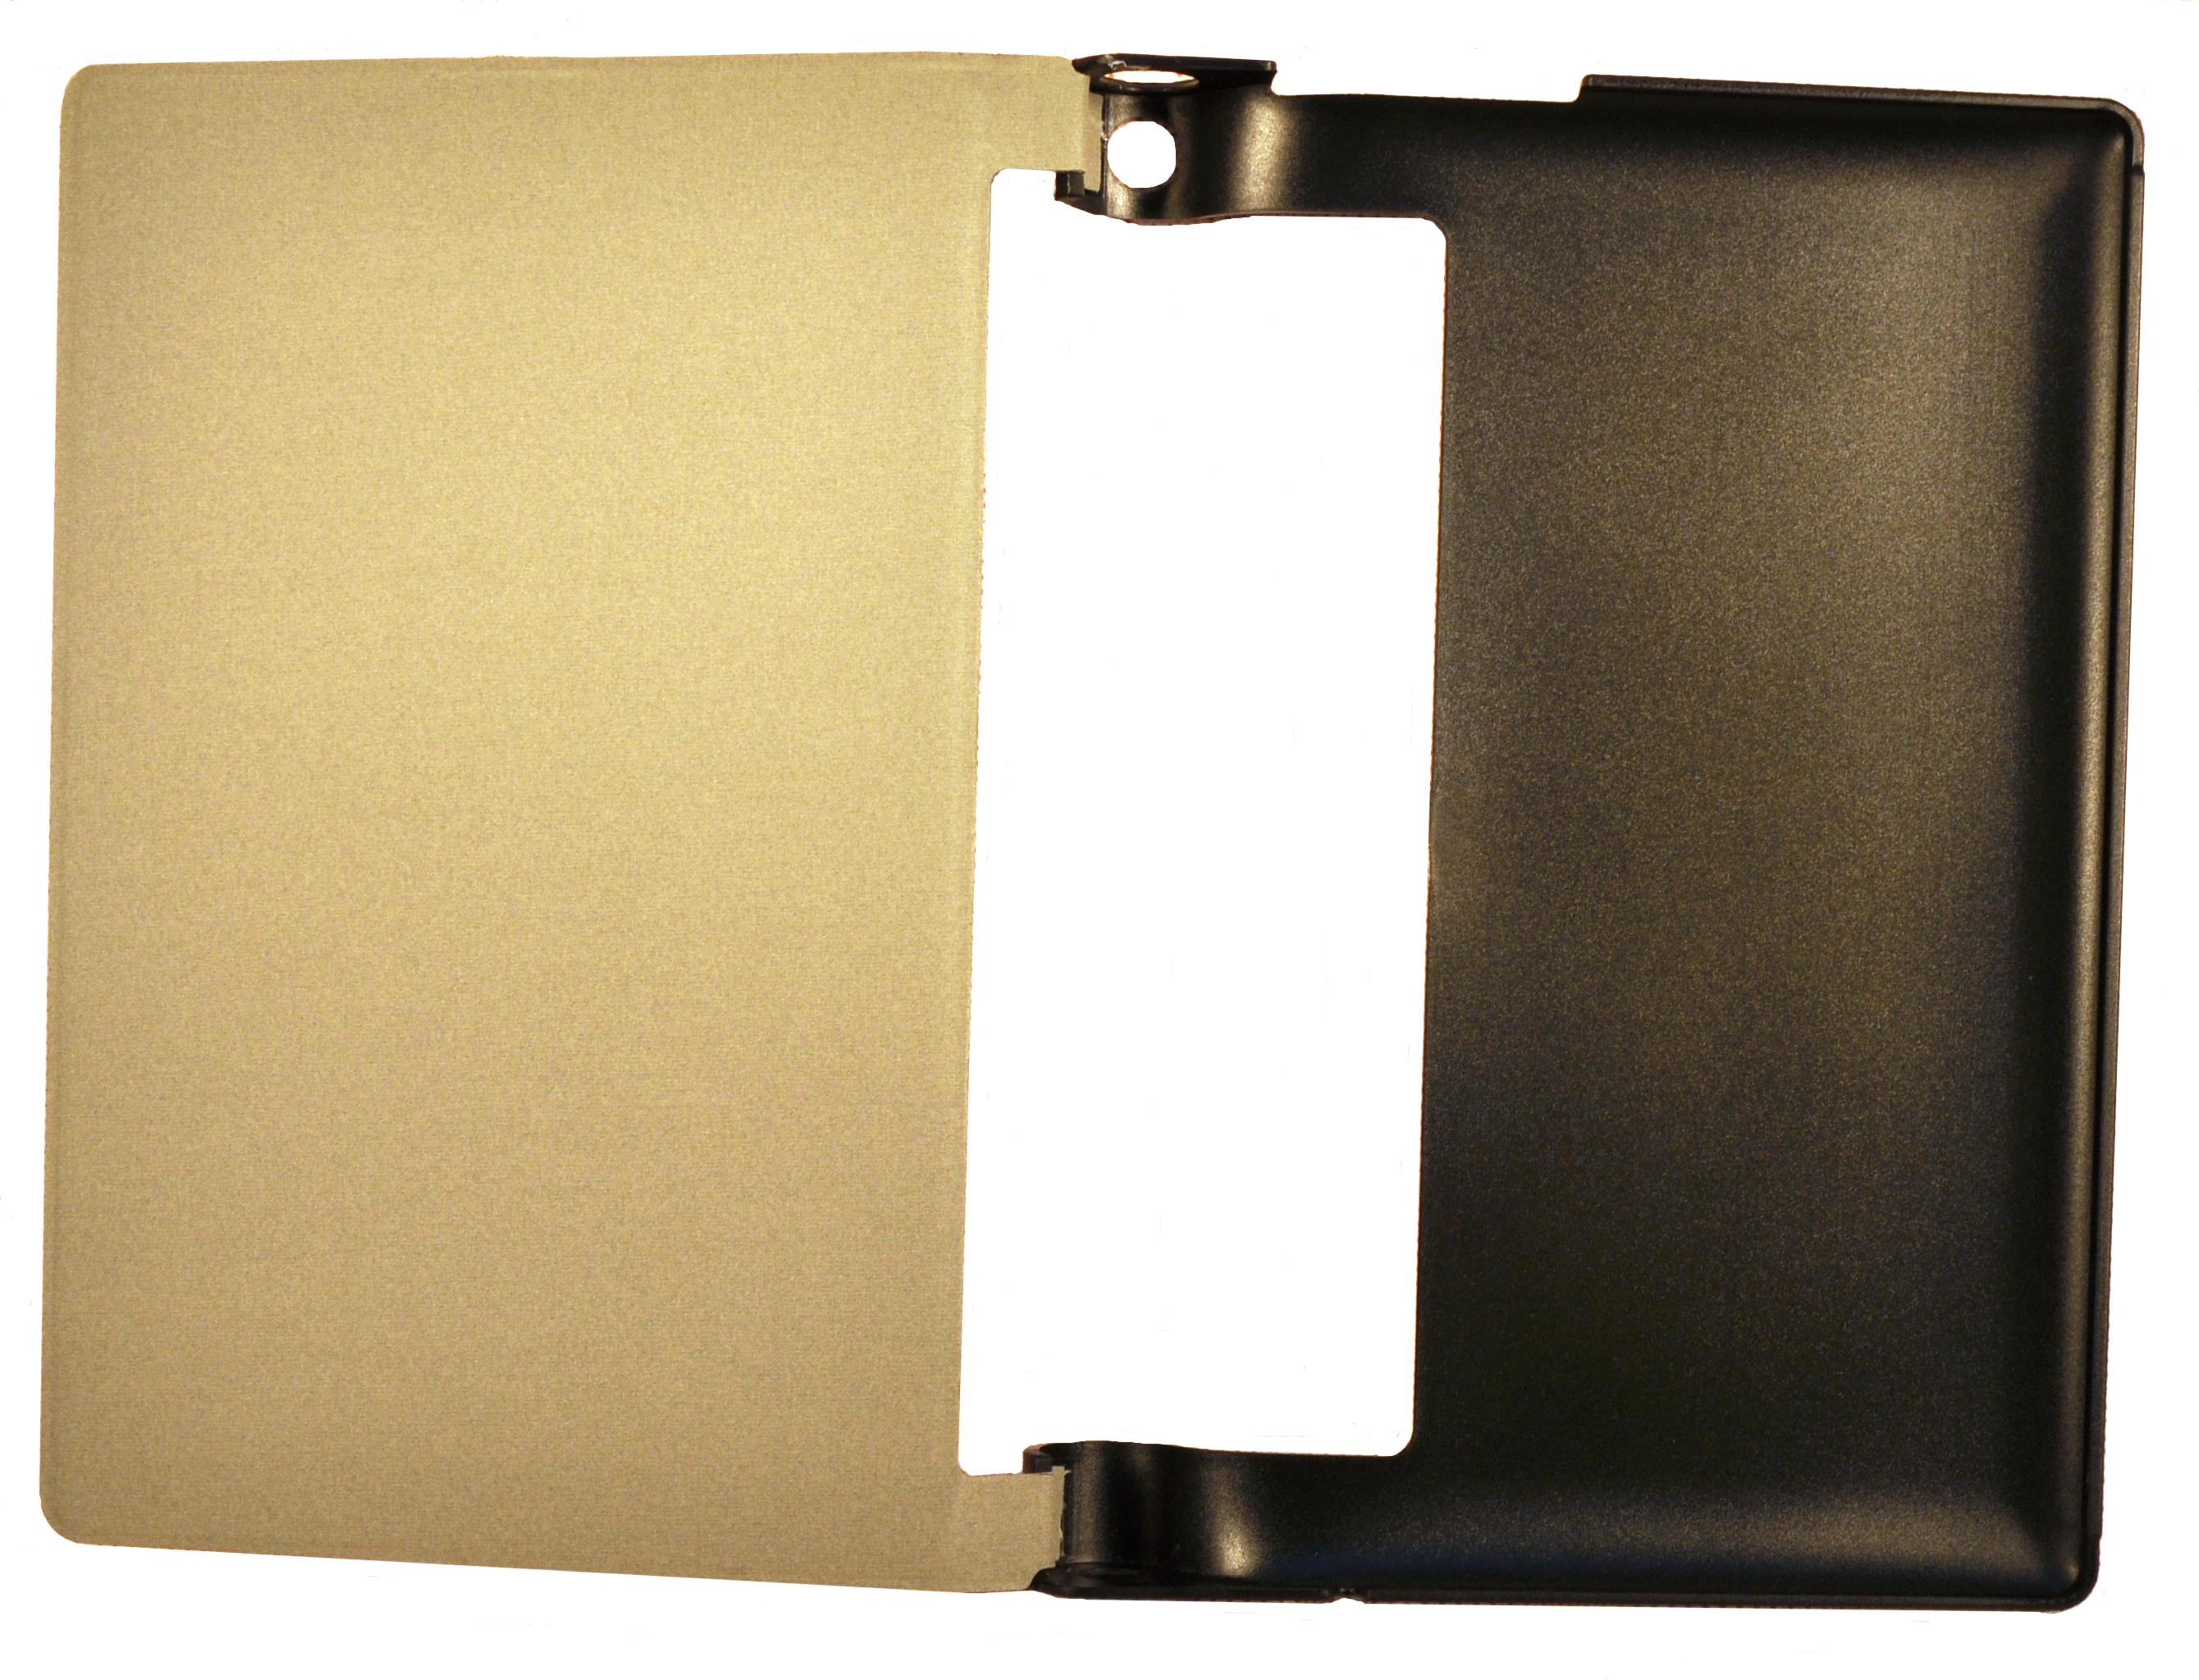 "����� Skinbox slim ��� Lenovo Yoga 2 8"" (����-������), P-L-Yoga28-001"